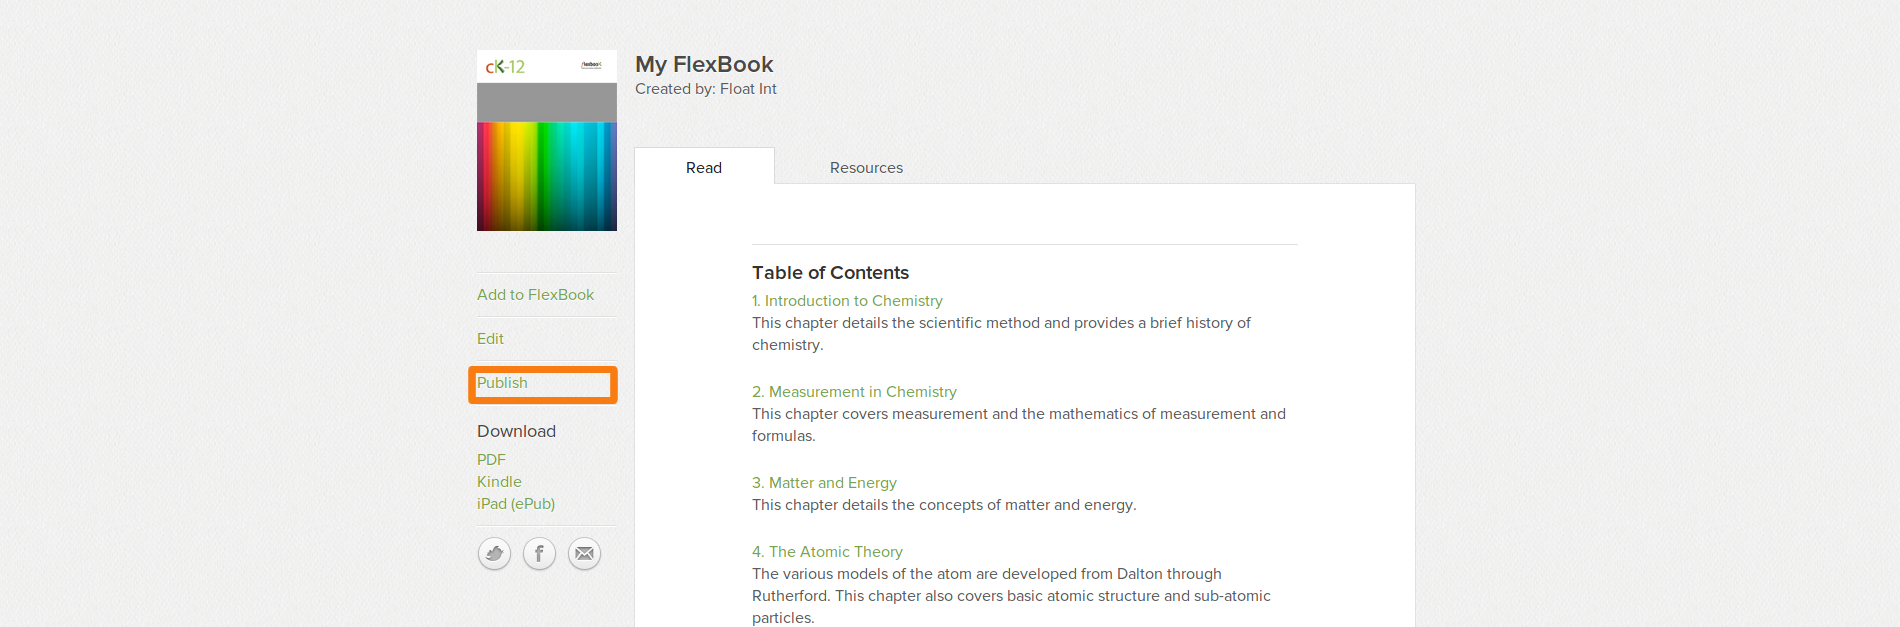 Publish FlexBook